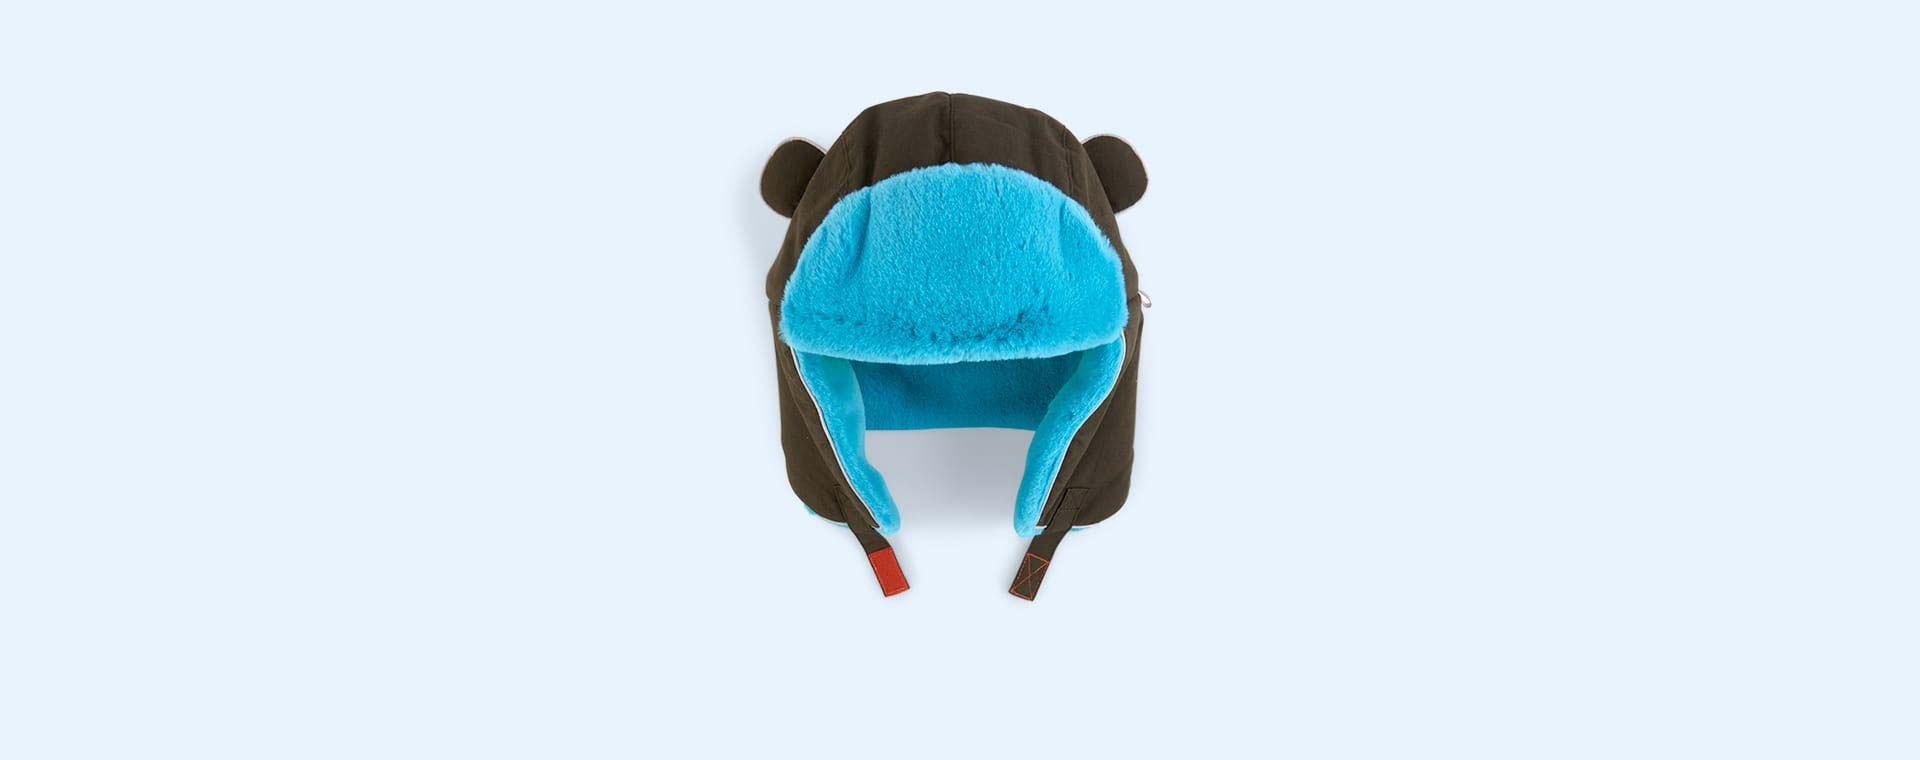 Turquoise Little Hotdog Watson The Arctic Cub Hat